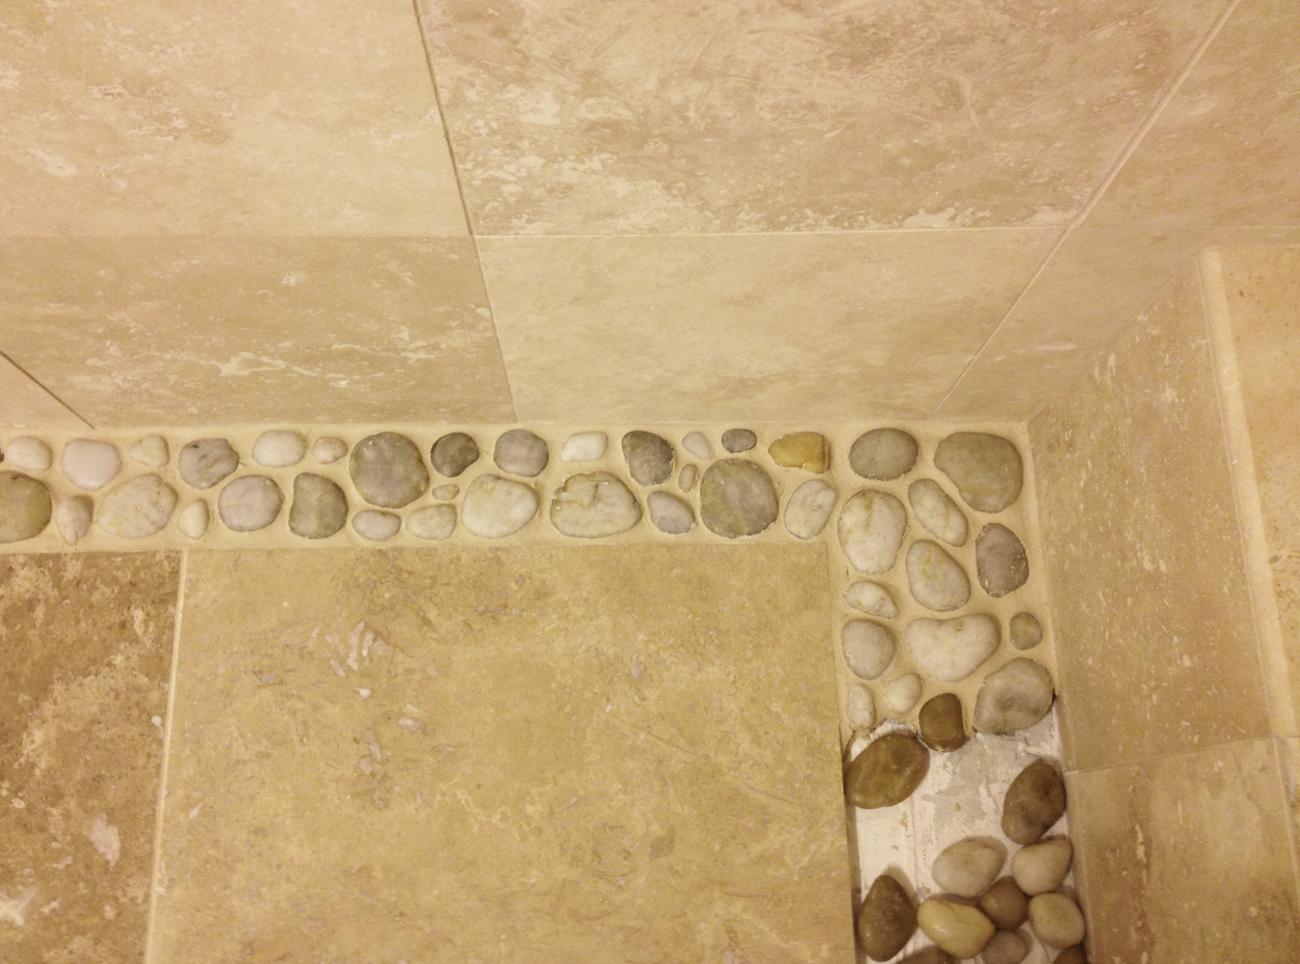 Apartmentf15 Bathroom Renovation Part 3 River Rock Accent Floor